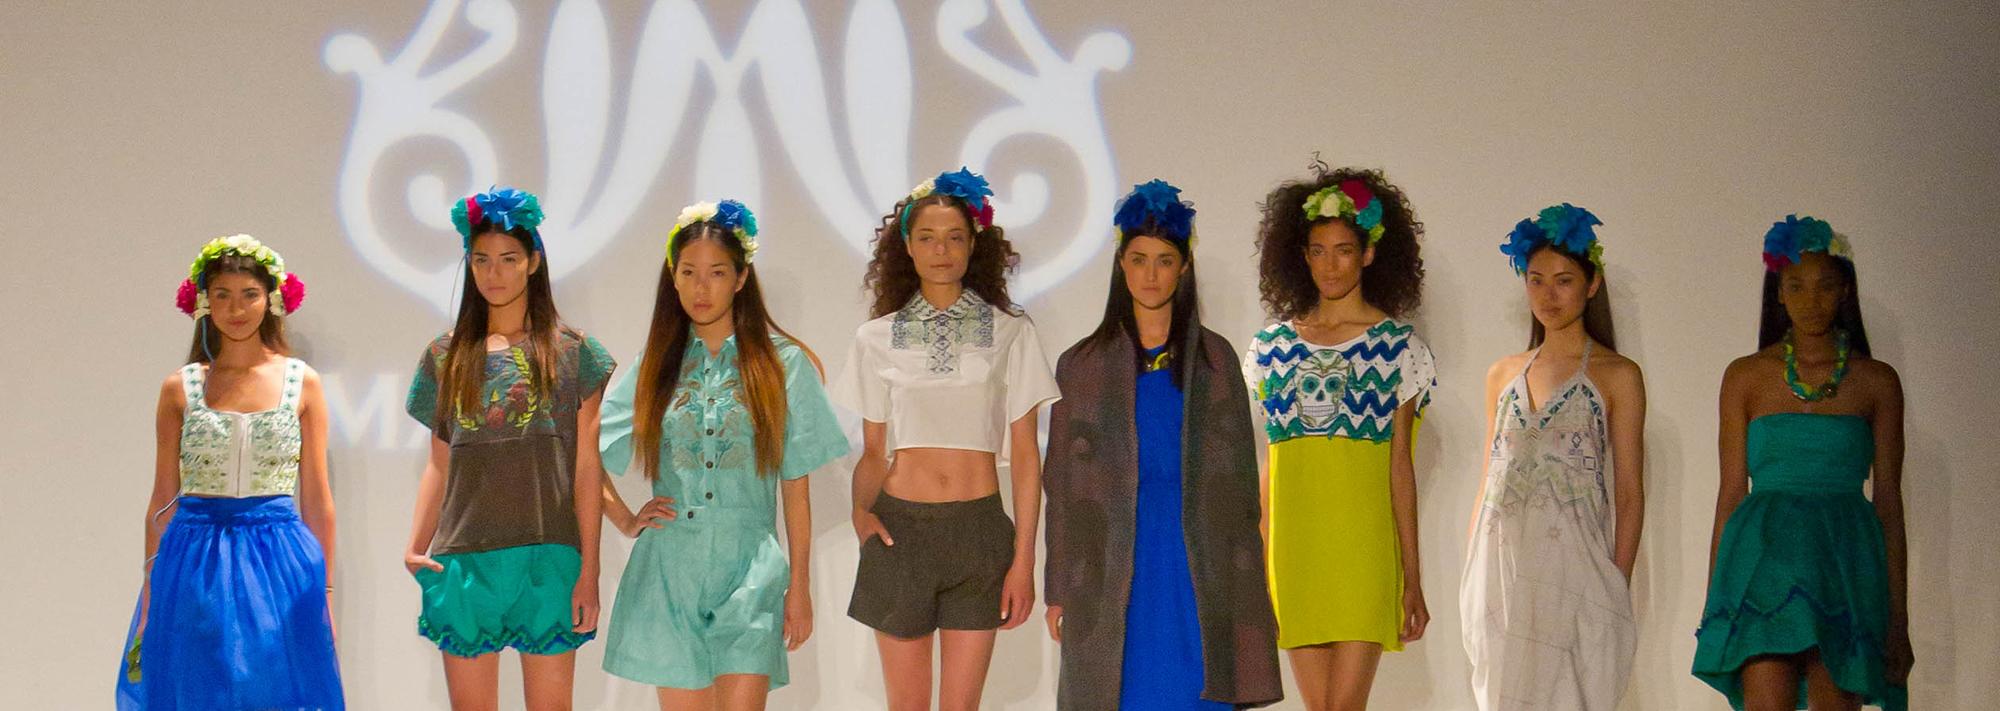 Marist Fashion image